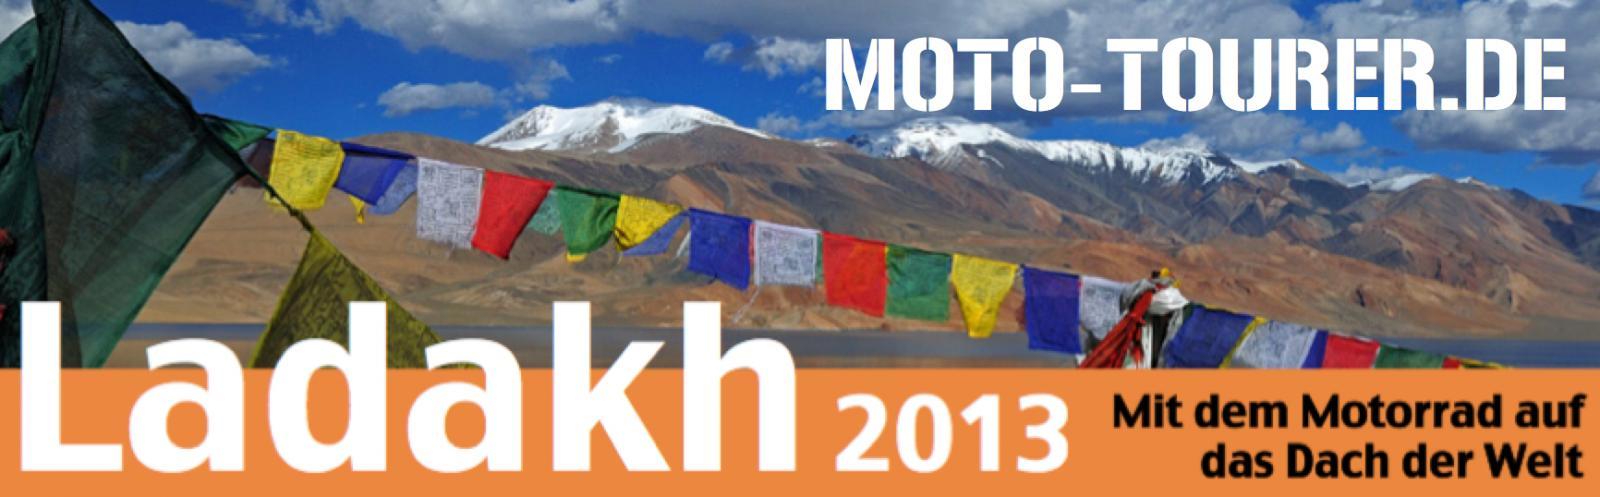 moto-tourer-ladakh-2013-logo.jpg